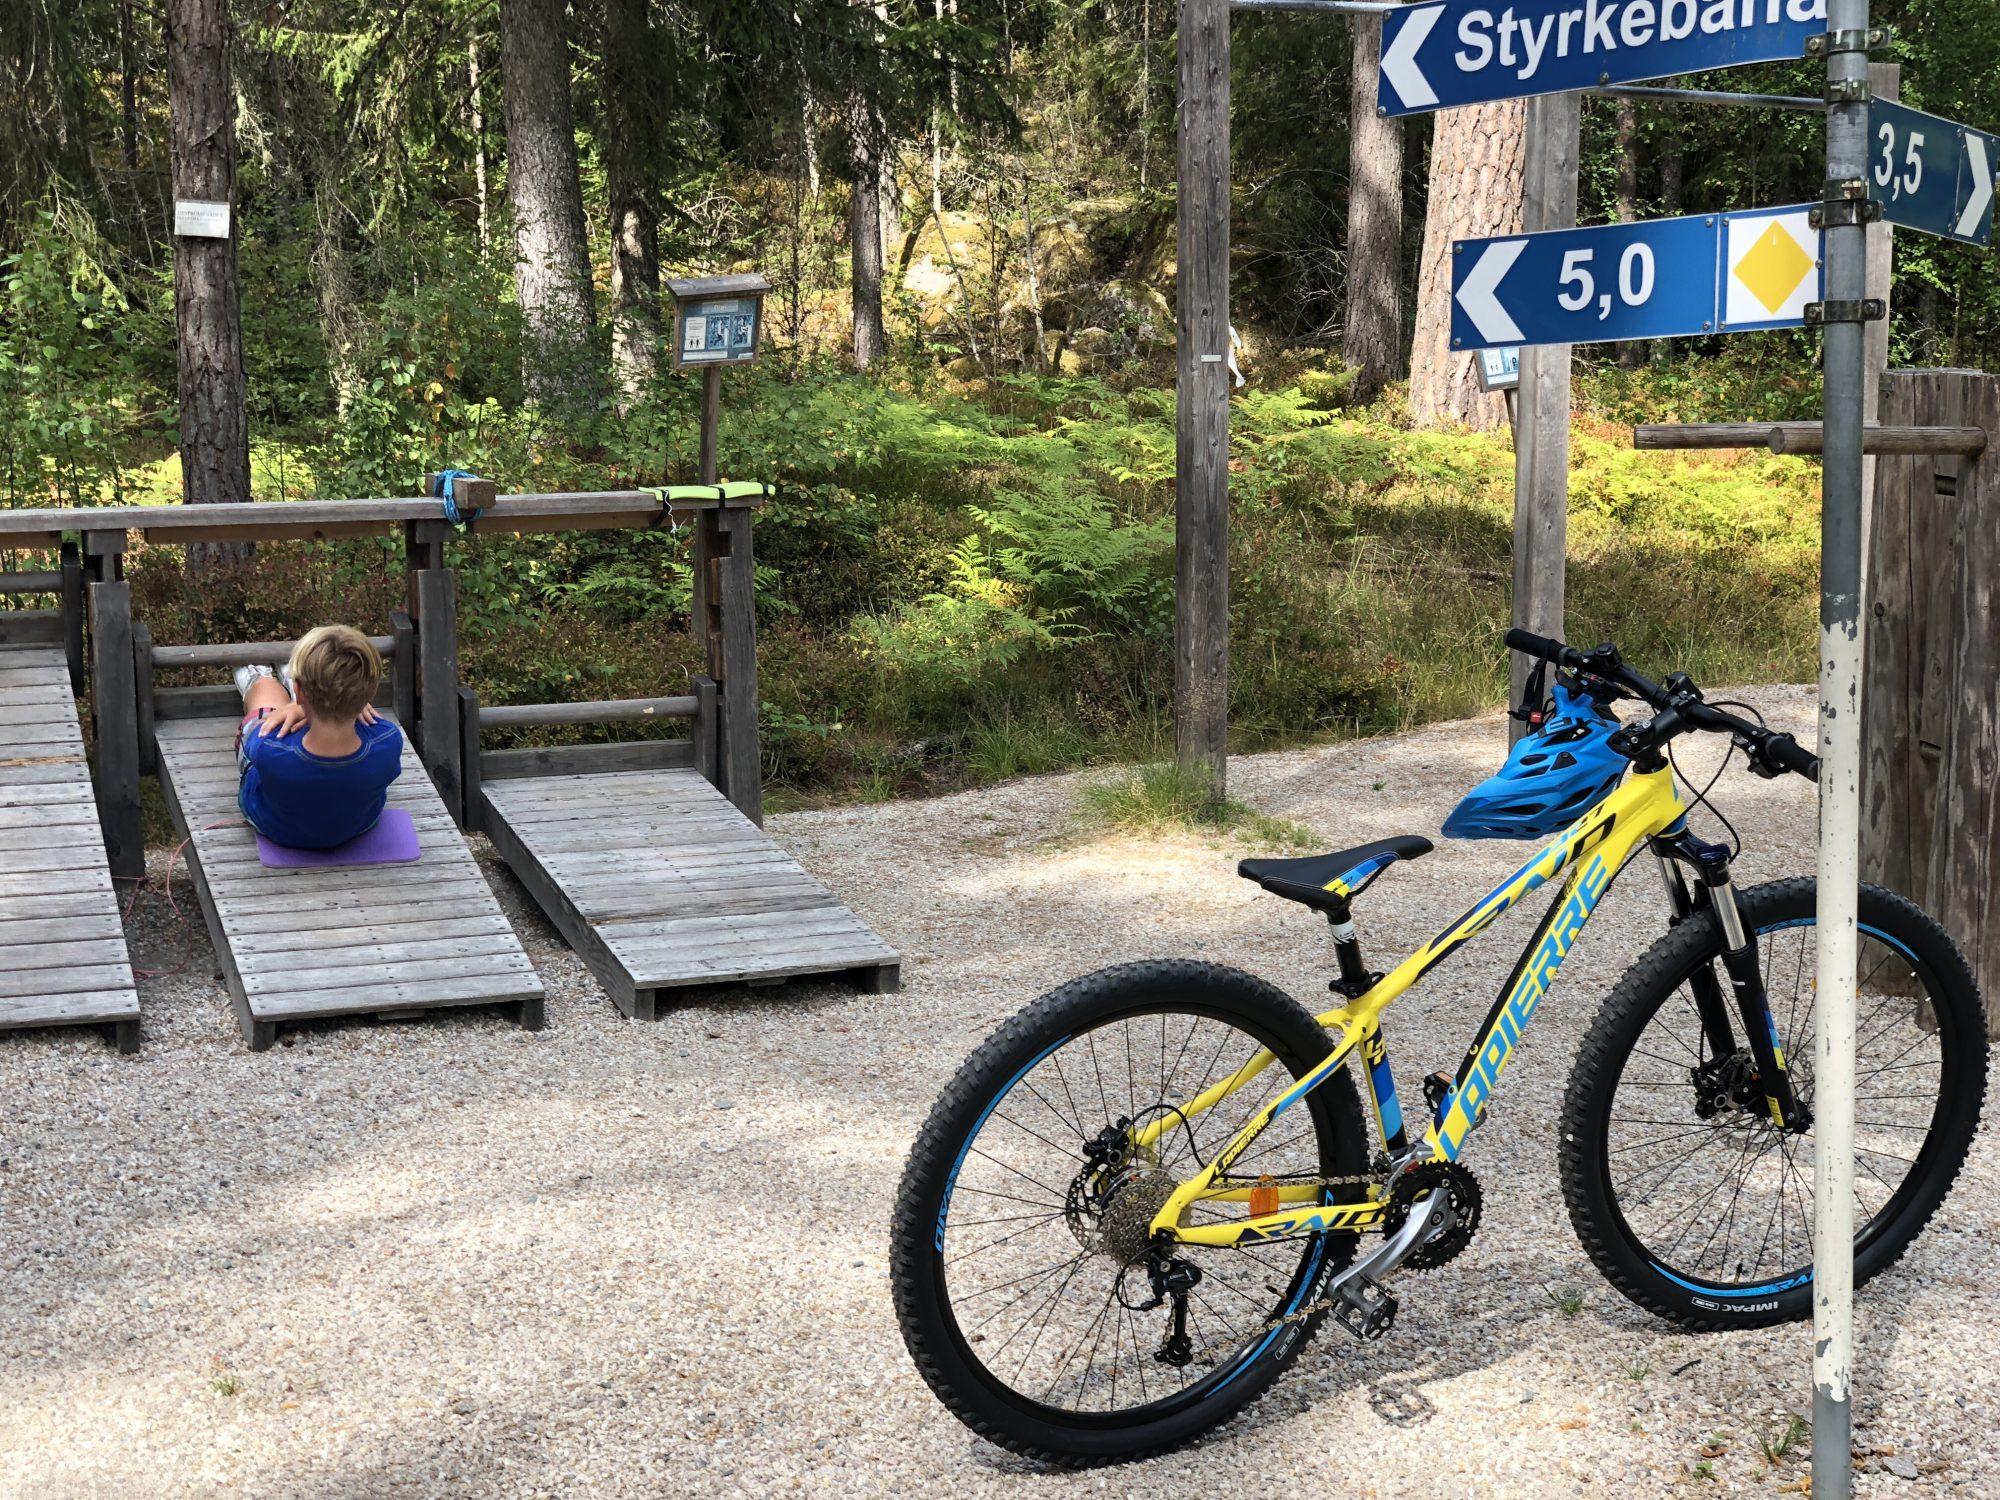 Skutberget i Karlstad